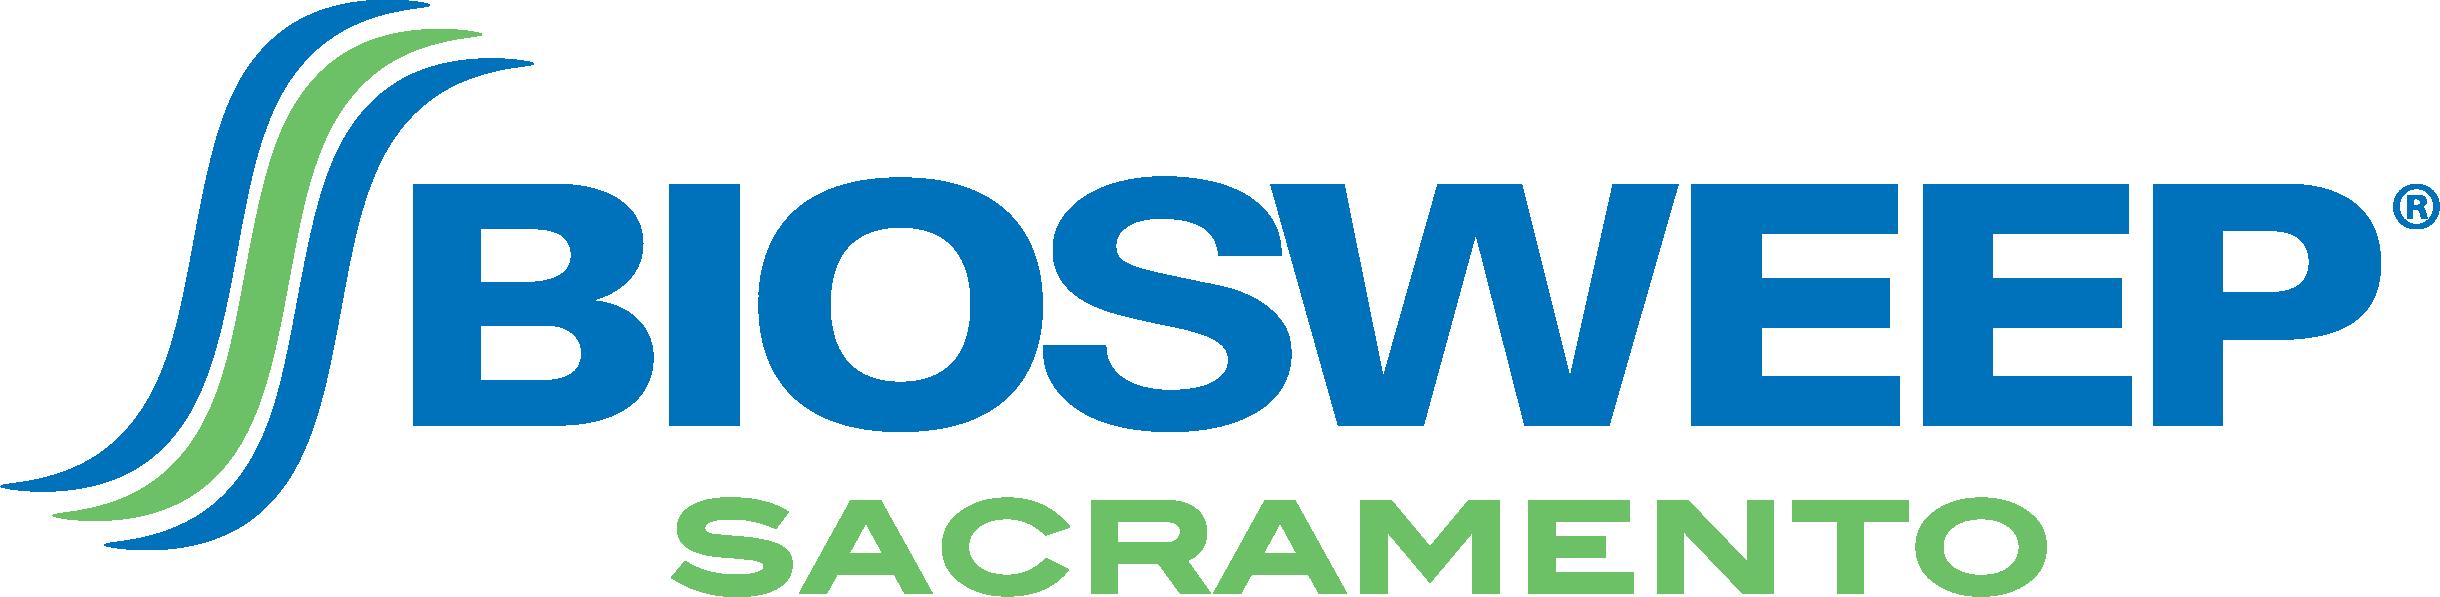 BiosweepSacremento-logo-fullcolor.png